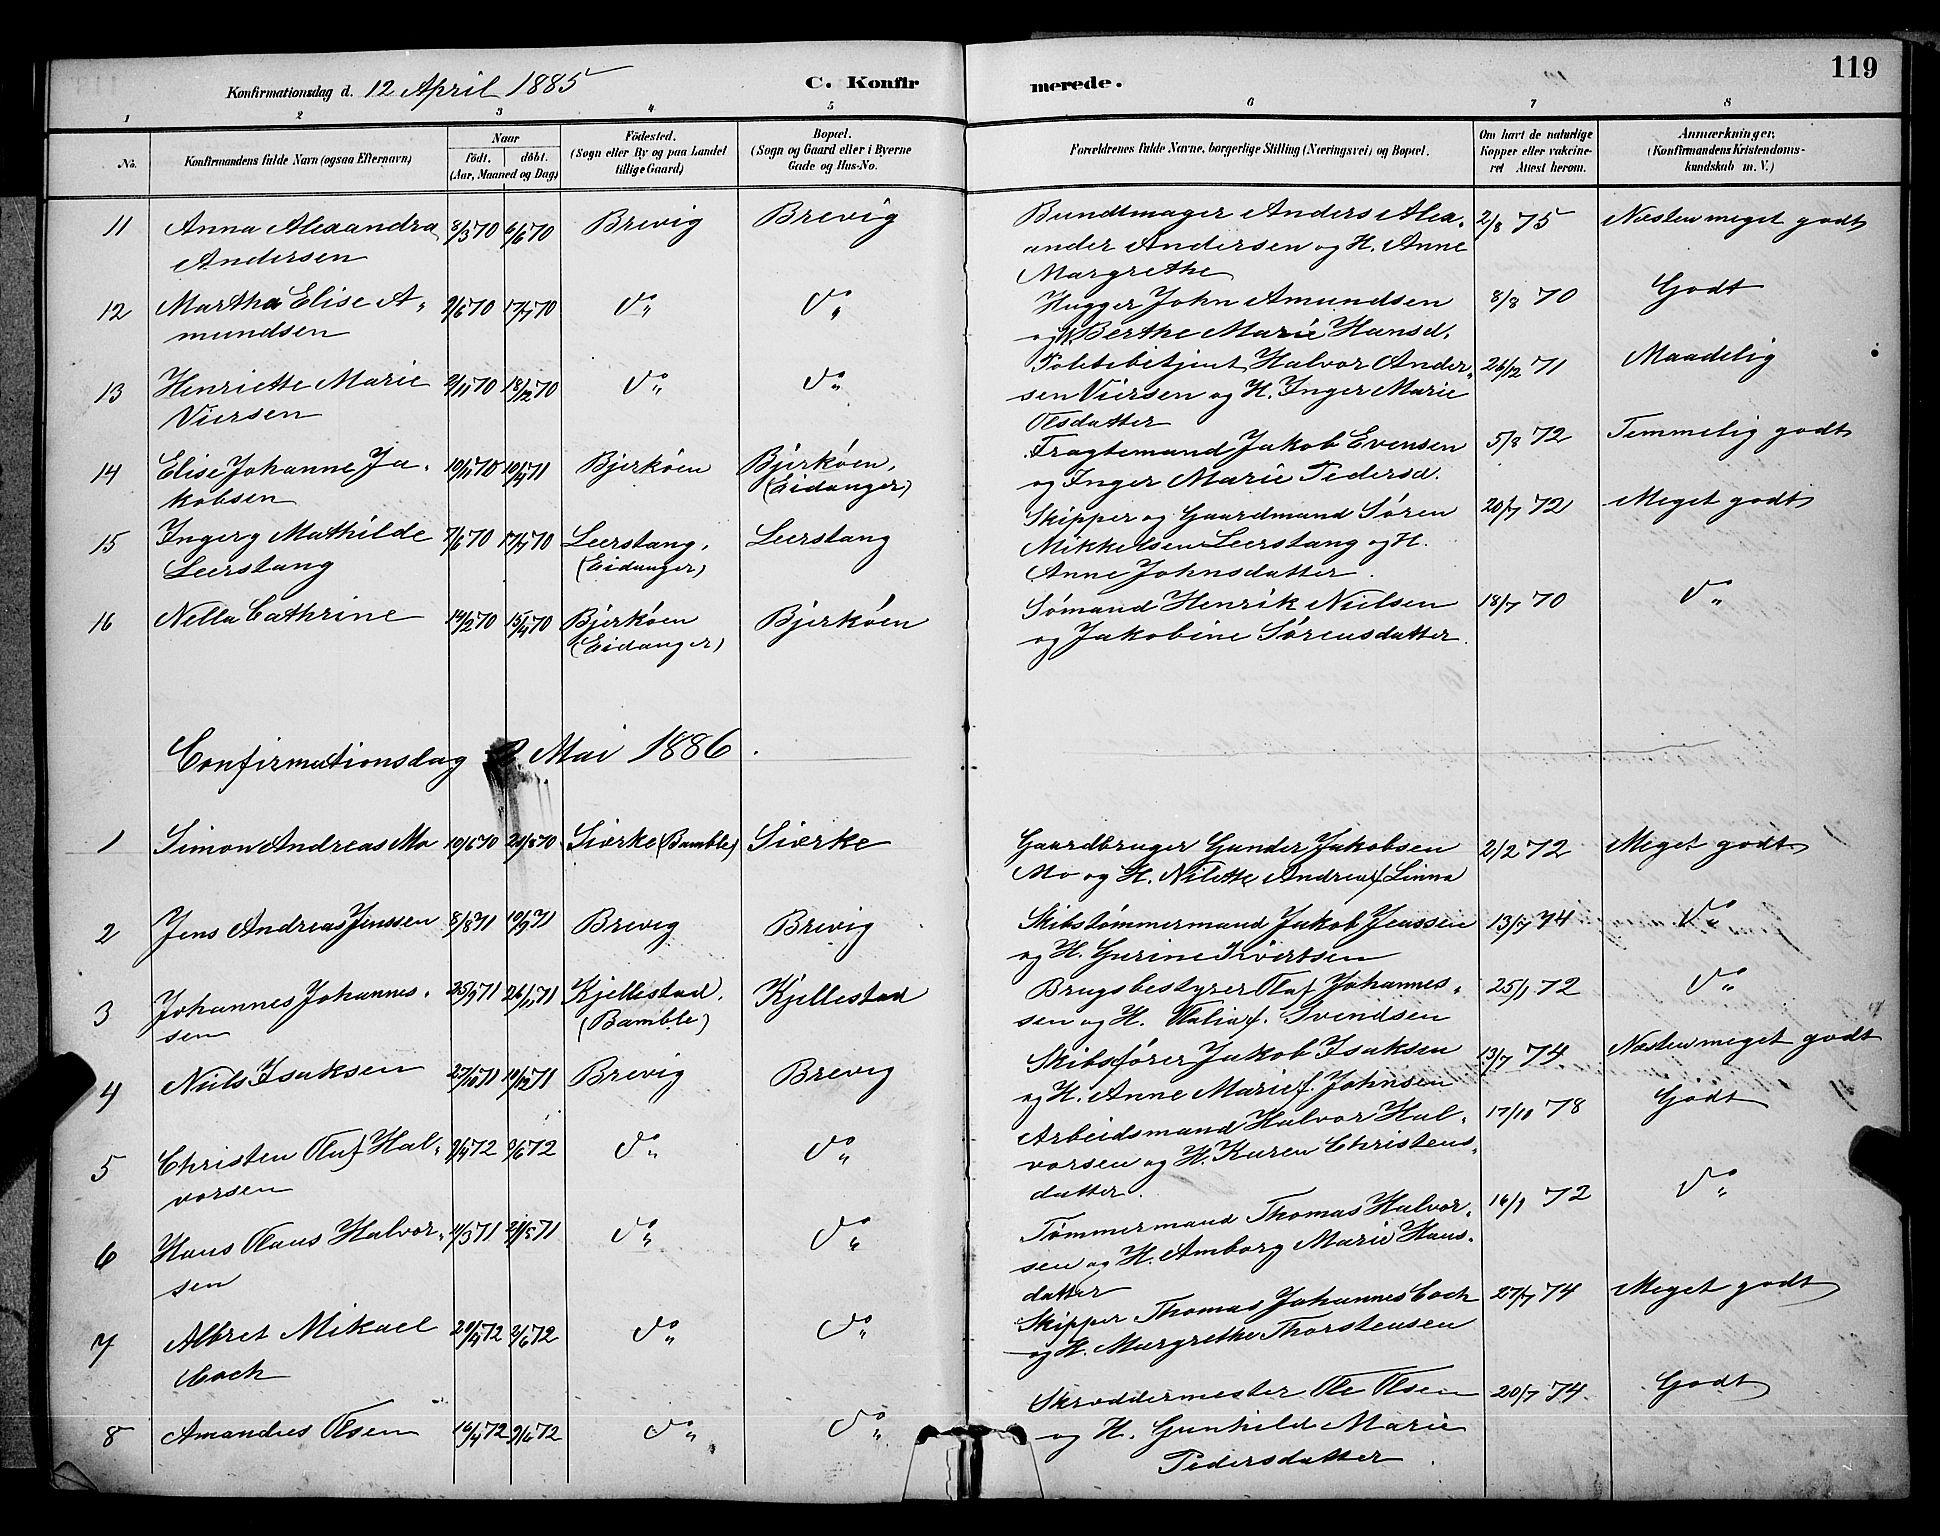 SAKO, Brevik kirkebøker, G/Ga/L0004: Klokkerbok nr. 4, 1882-1900, s. 119